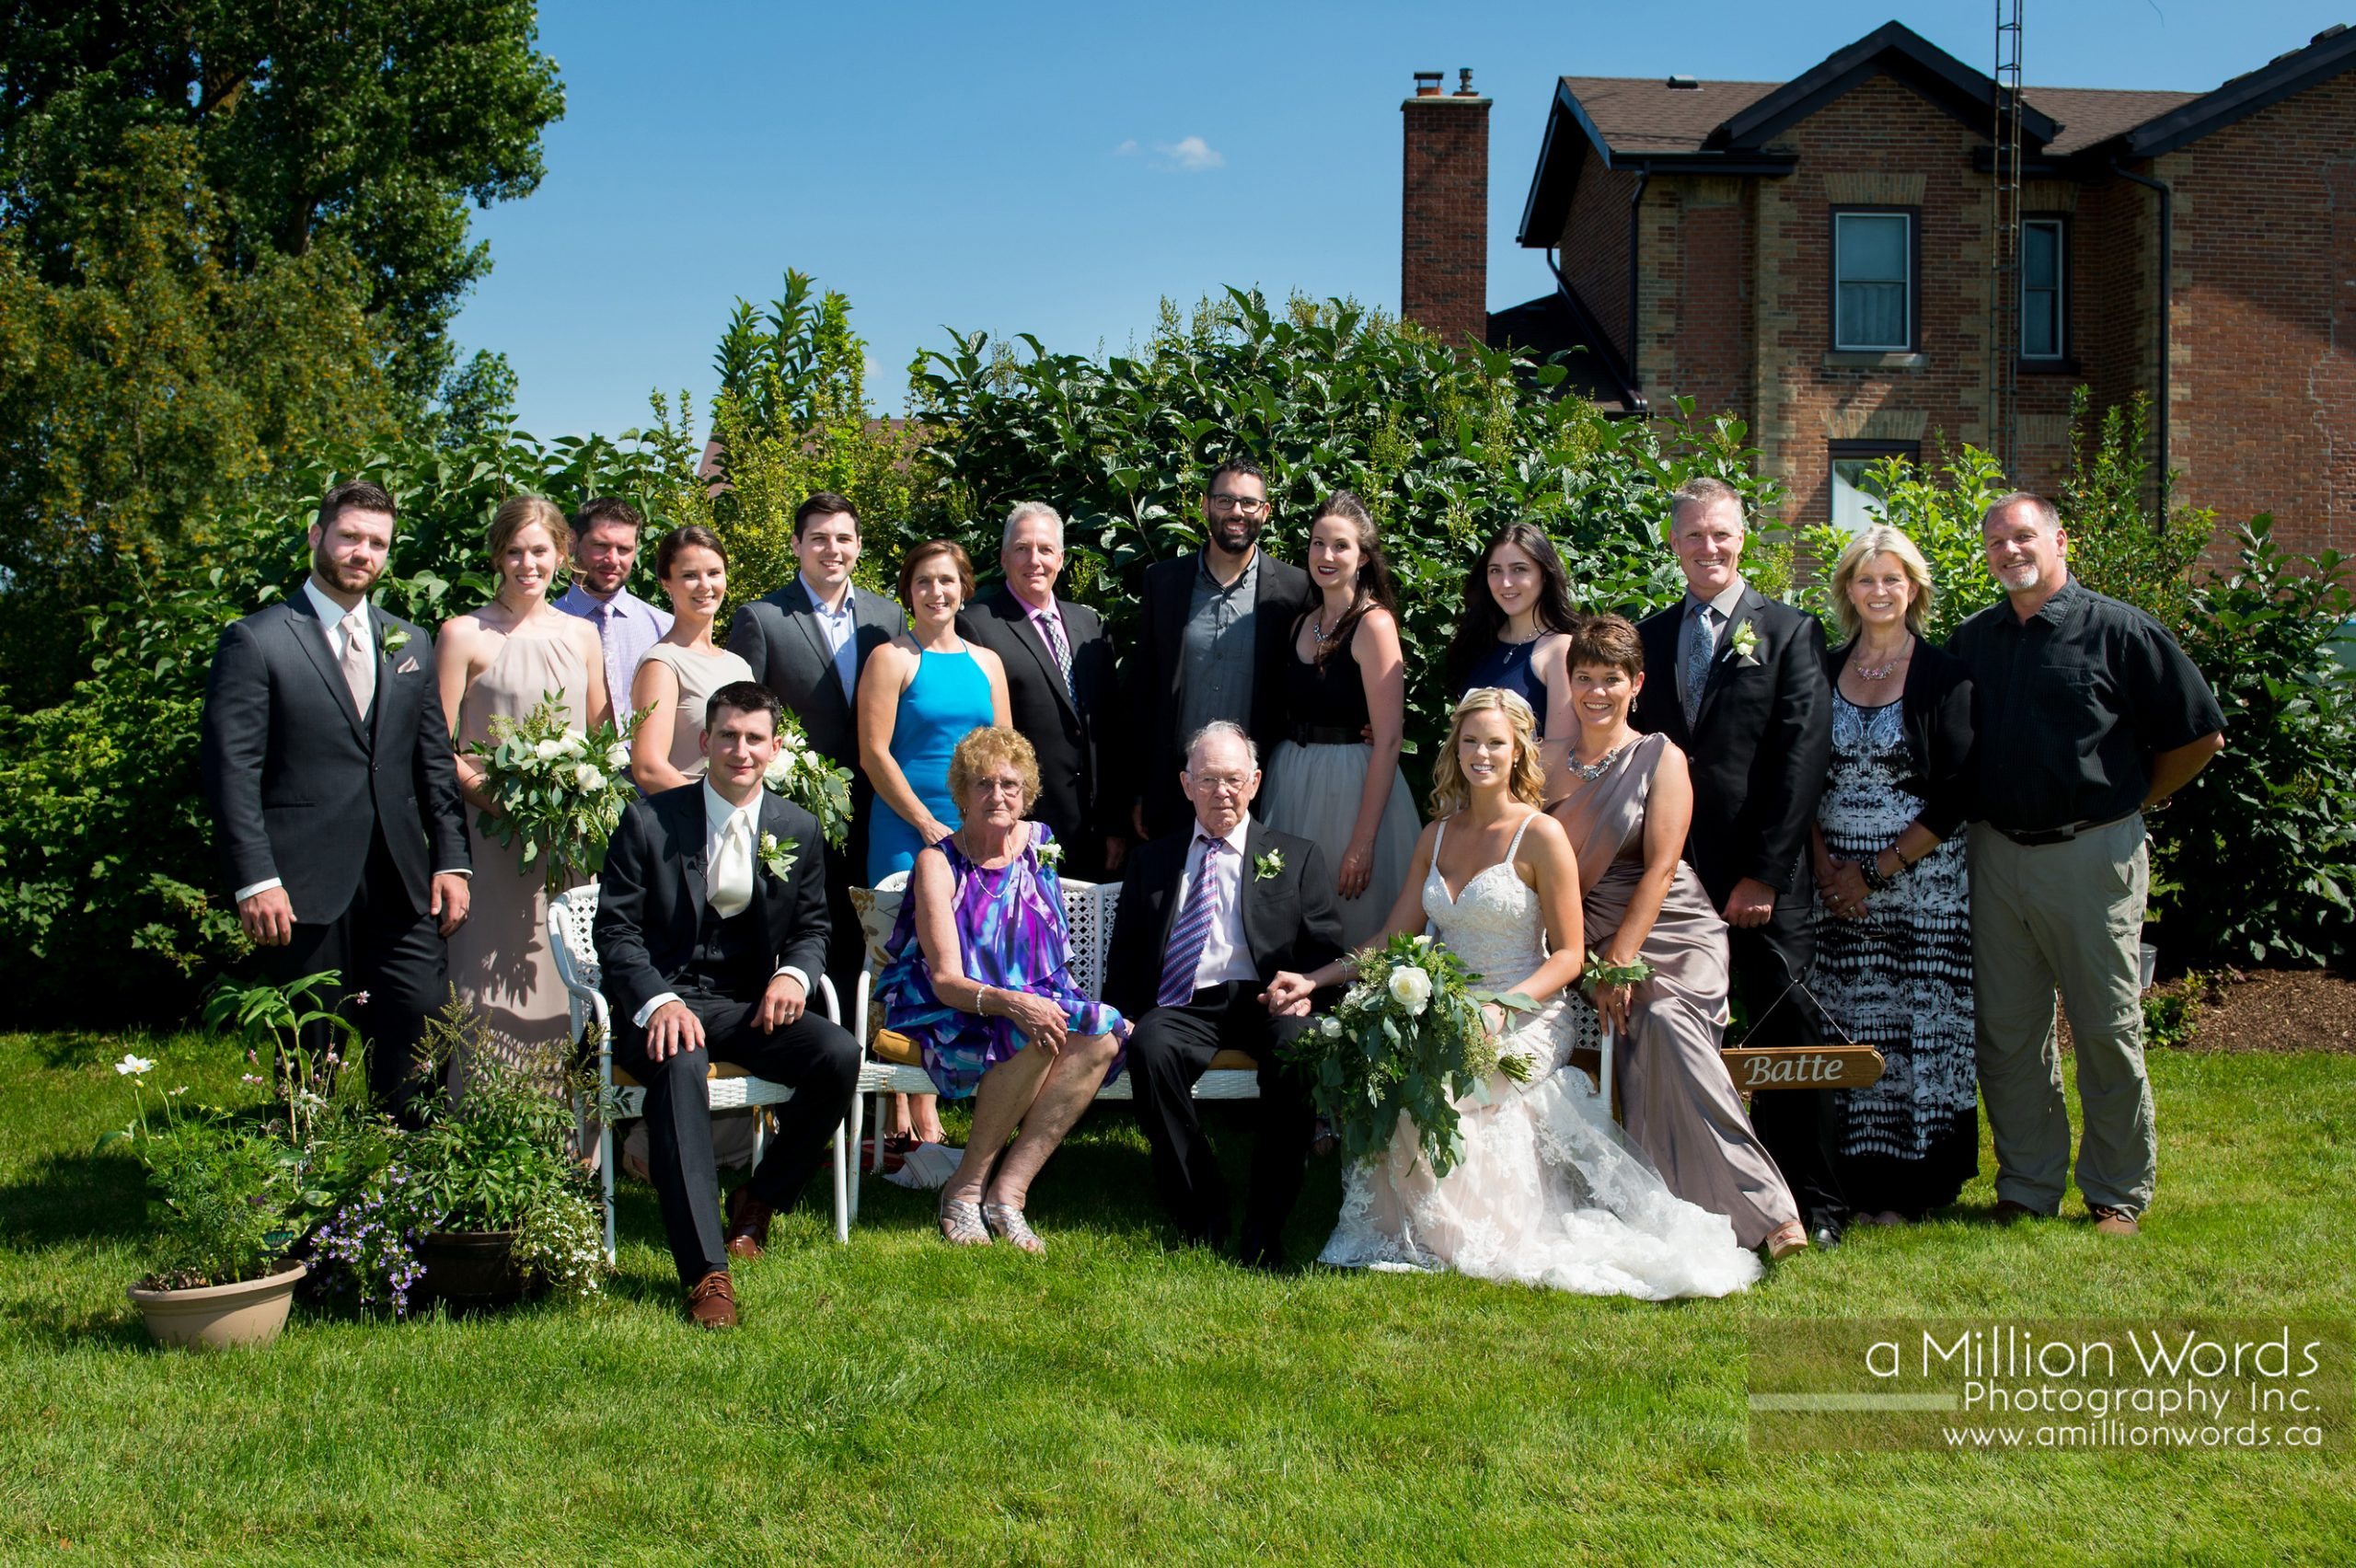 arthur_wedding_photographer41